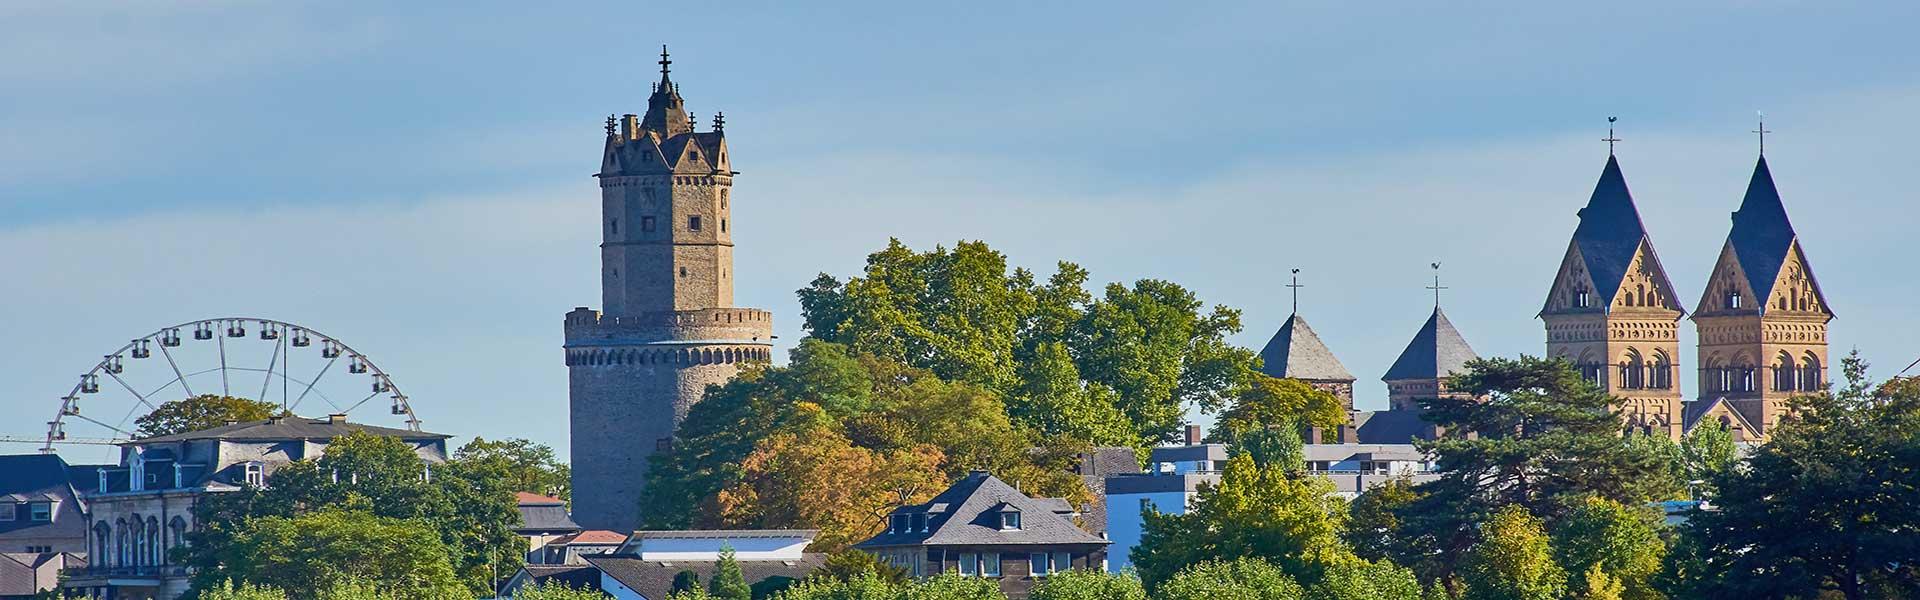 Panorama Andernach mit Liebfrauenkirche